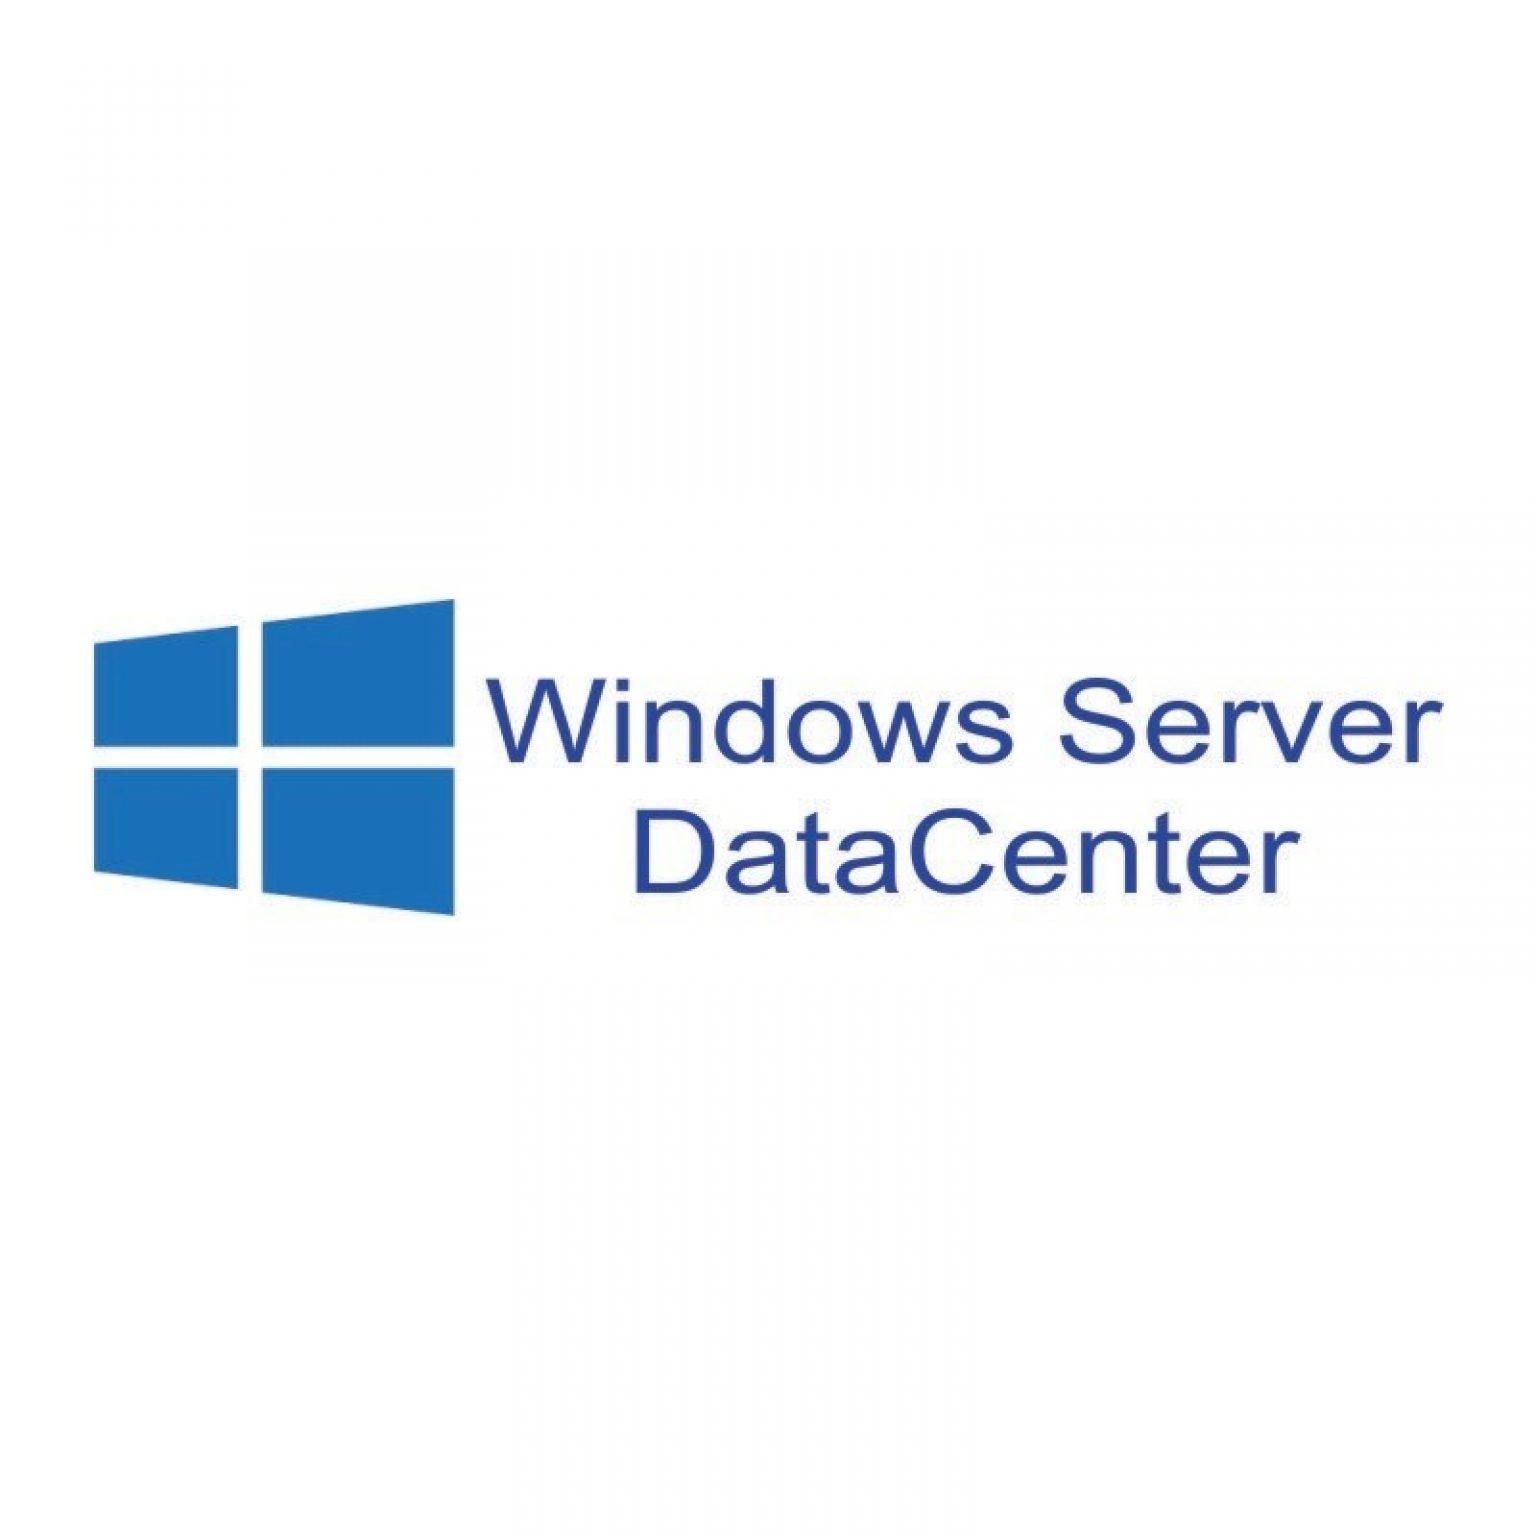 MICROSOFT - [Windows Svr ExtrnConn]WinSvrExtConn LicSAPk OLP NL Gov Qlfd[Pemerintah]